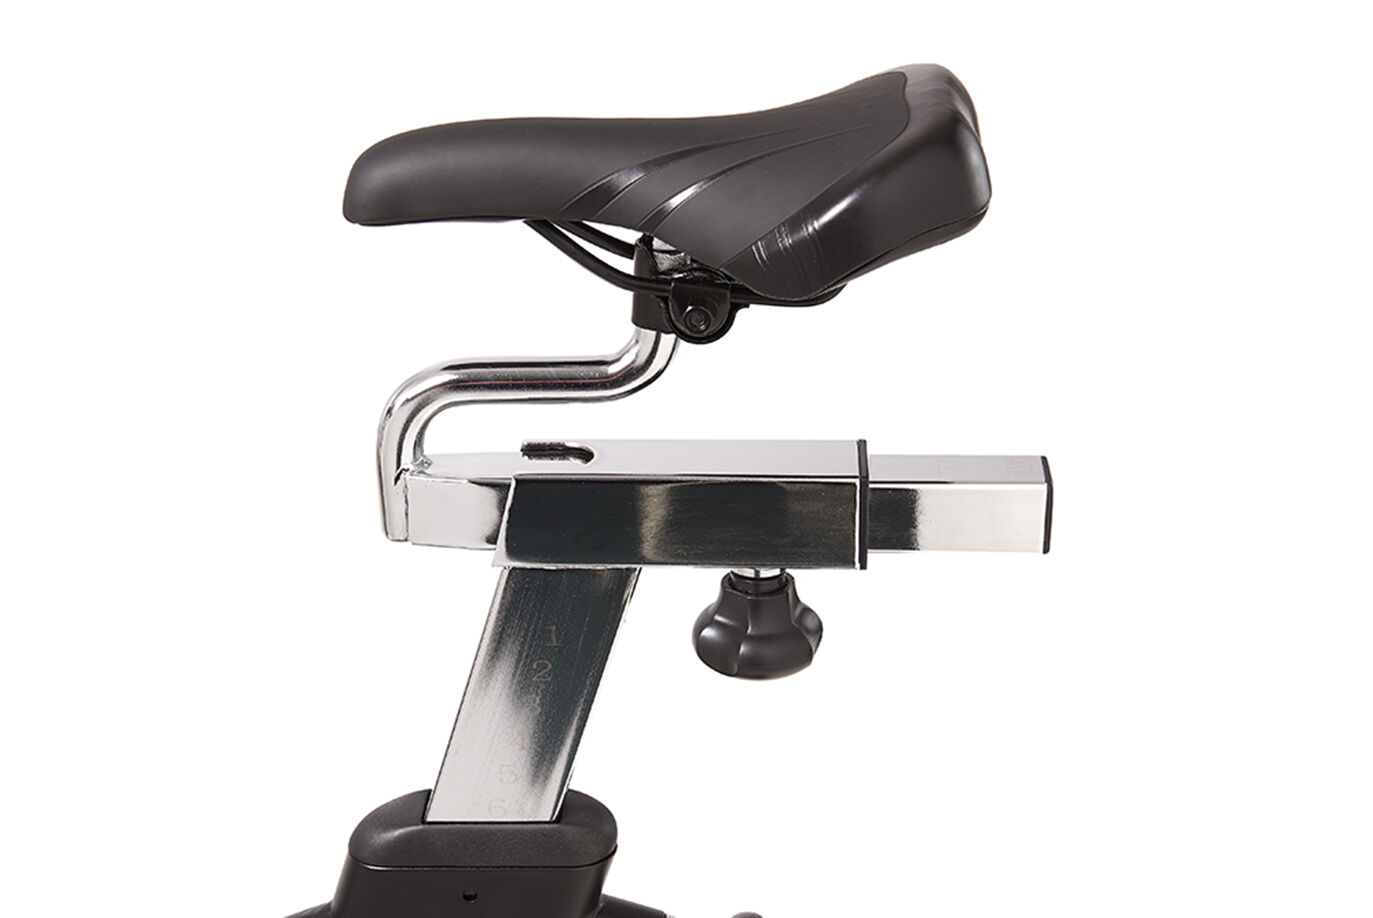 Adjustable Seat on the JTX Cyclo 6 Indoor Bike